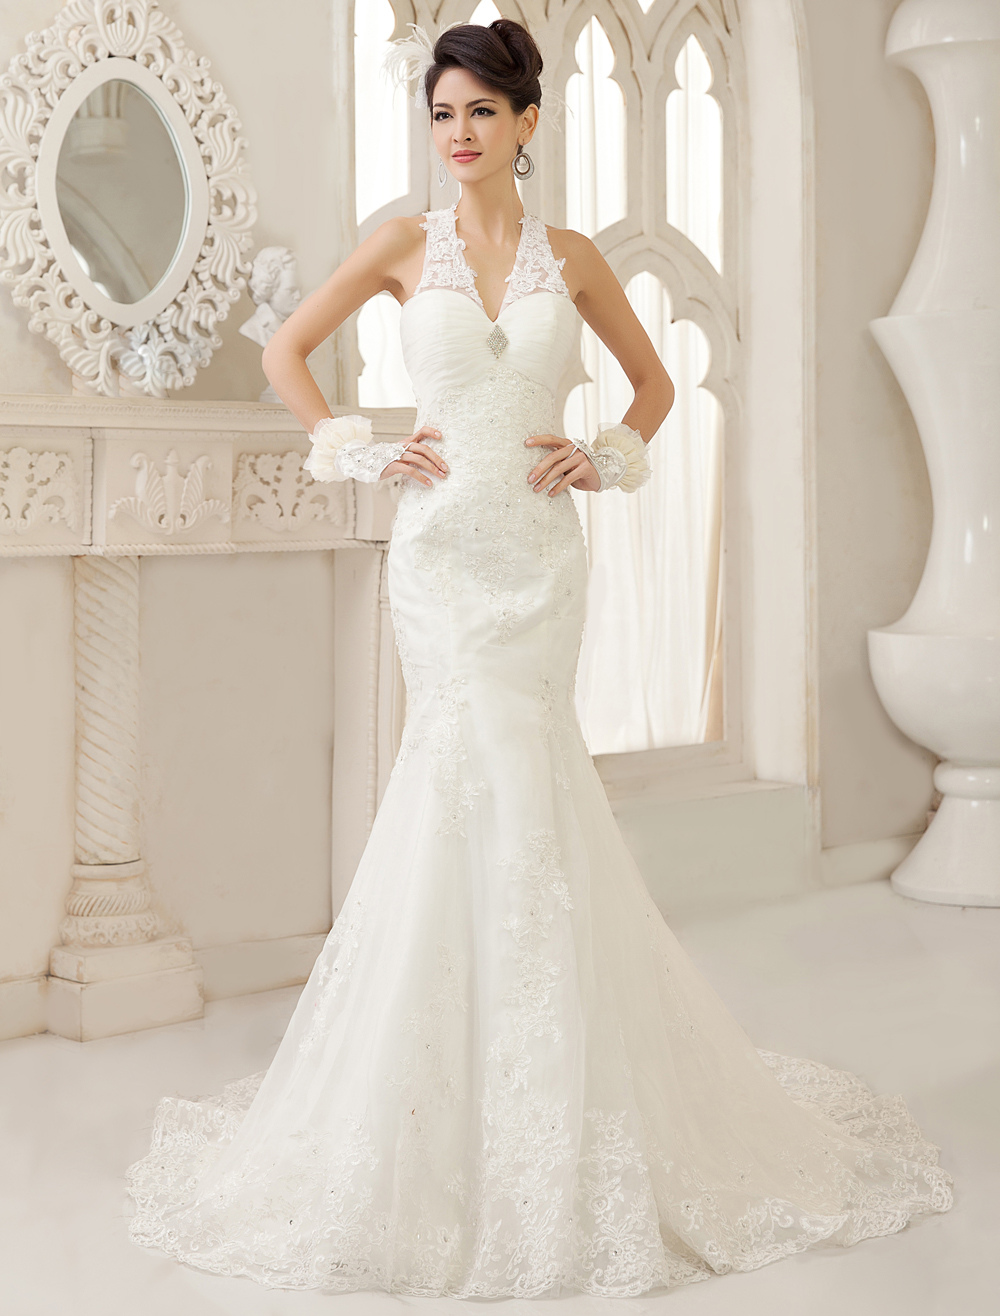 White Mermaid V-Neck Ruched Court Train Wedding Dress For Bride  Milanoo